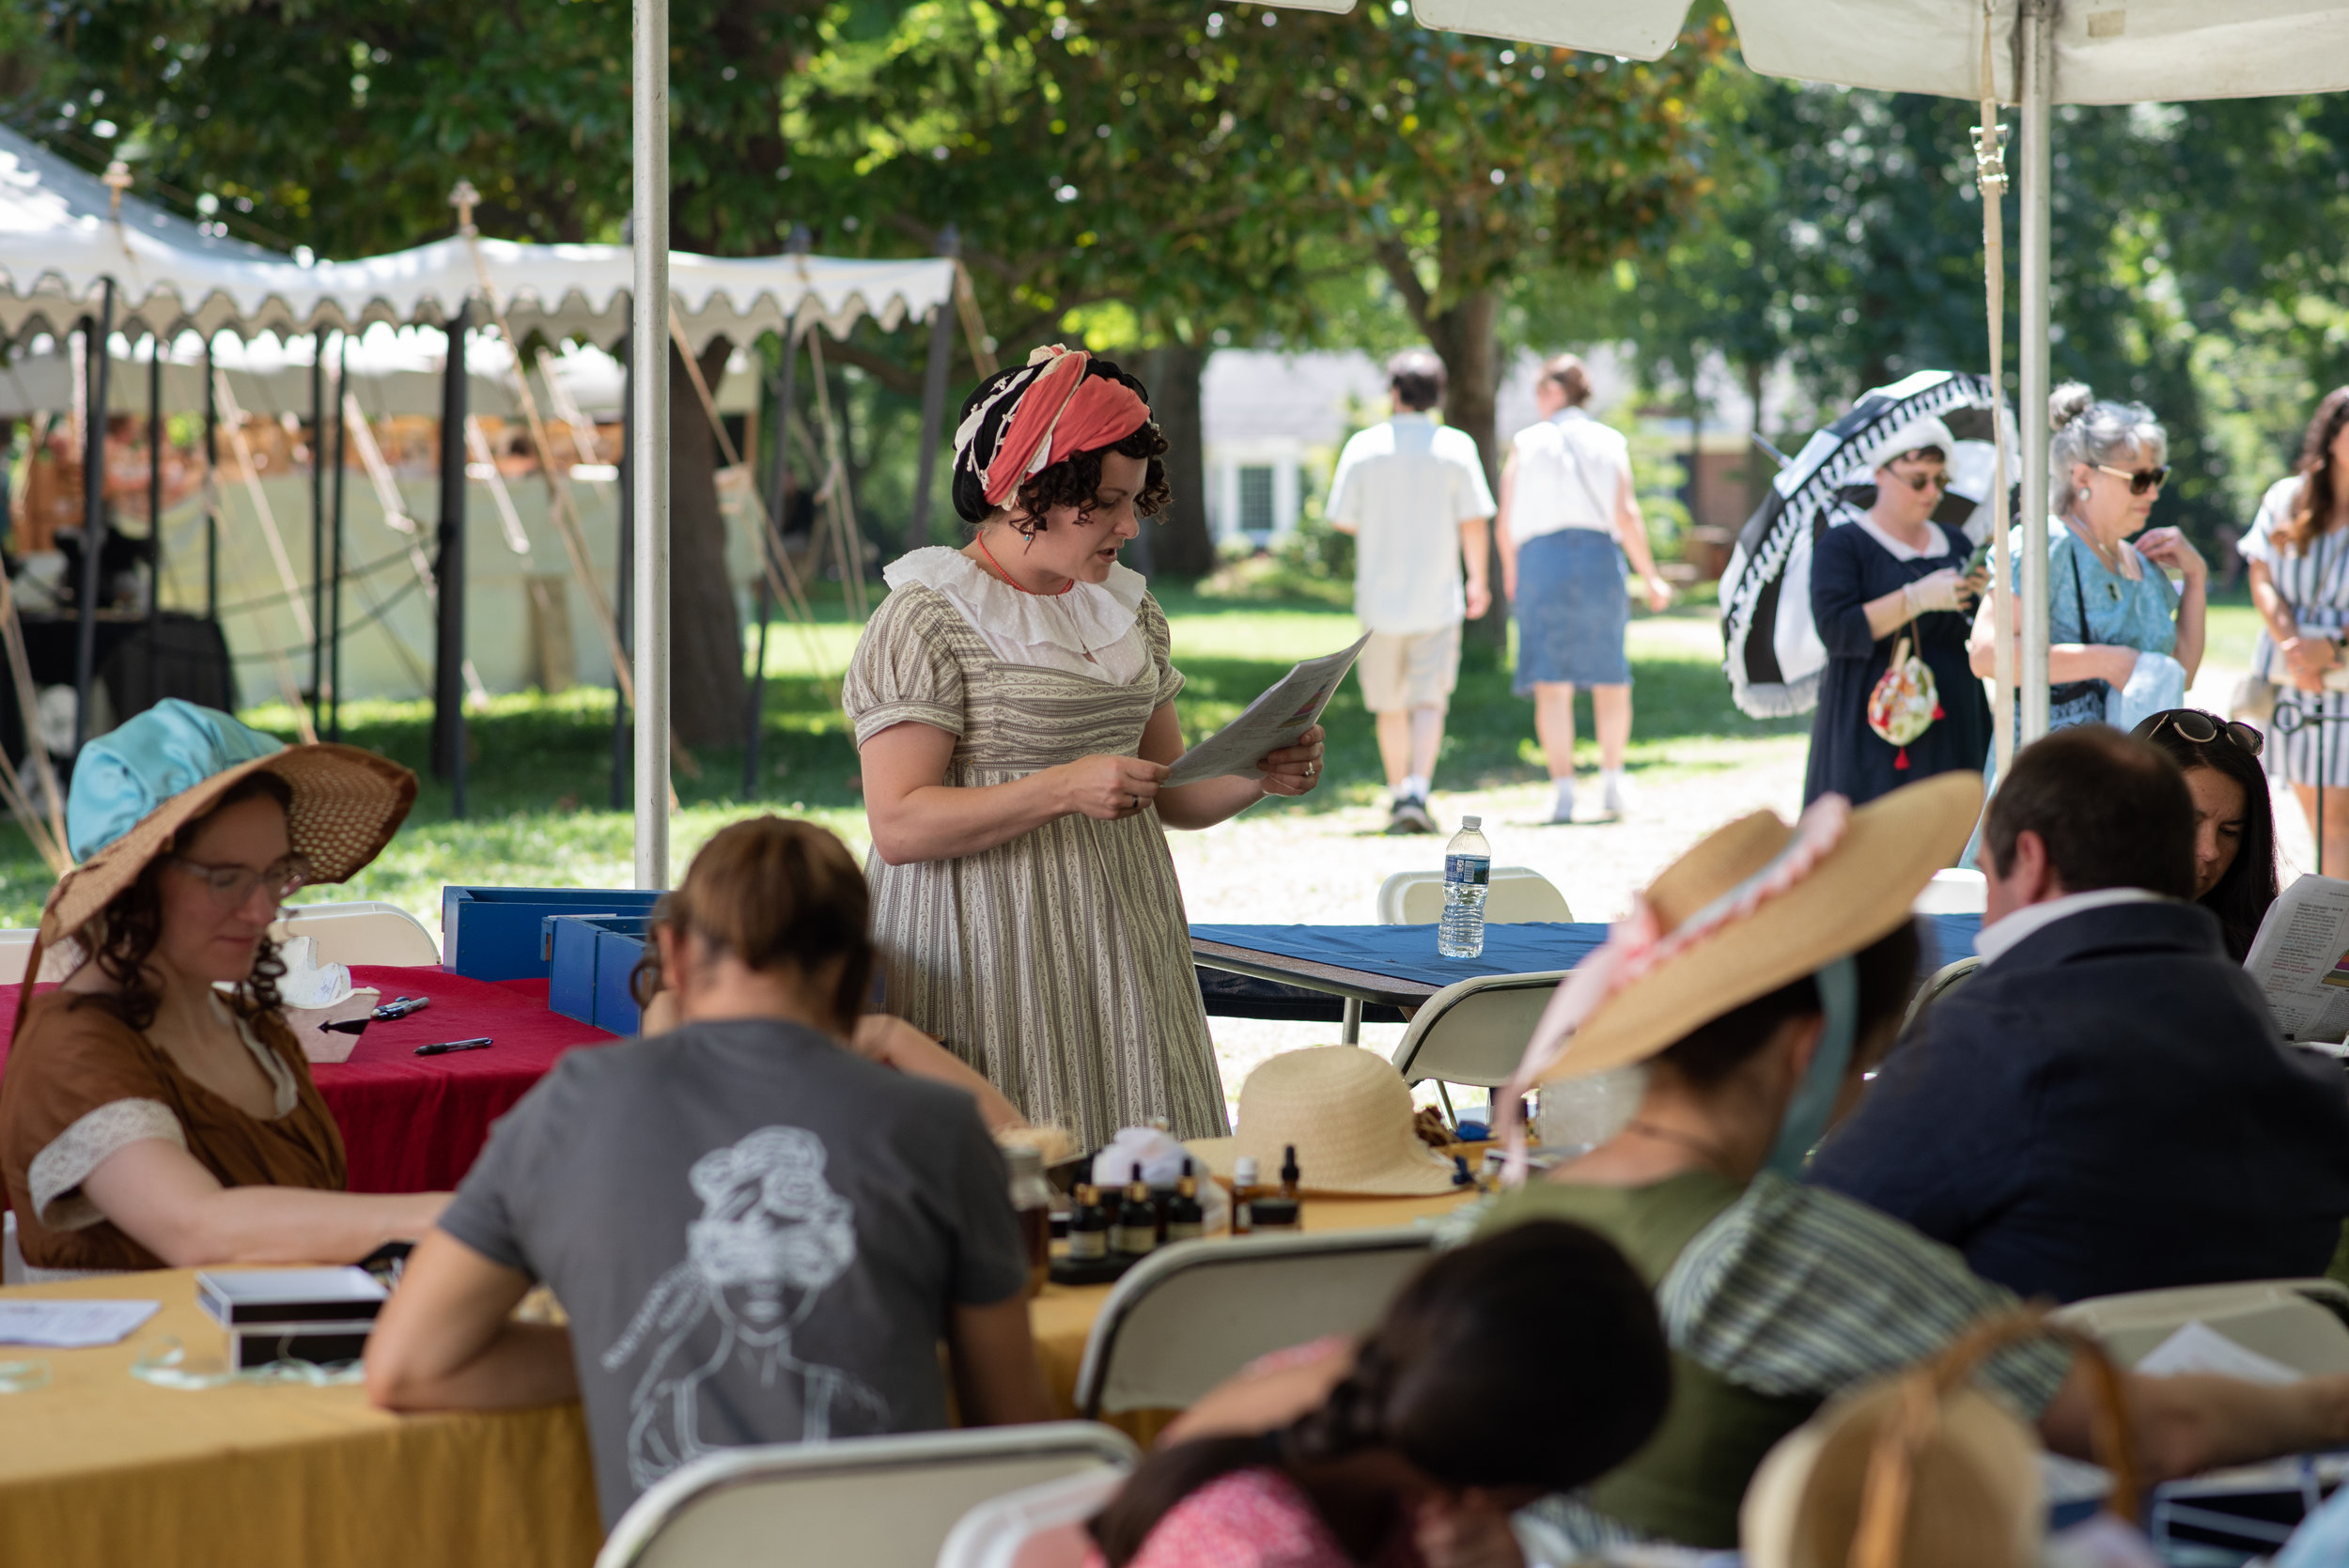 LBCC Historical Perfumes scents Jane Austen Festival Kentucky 2019